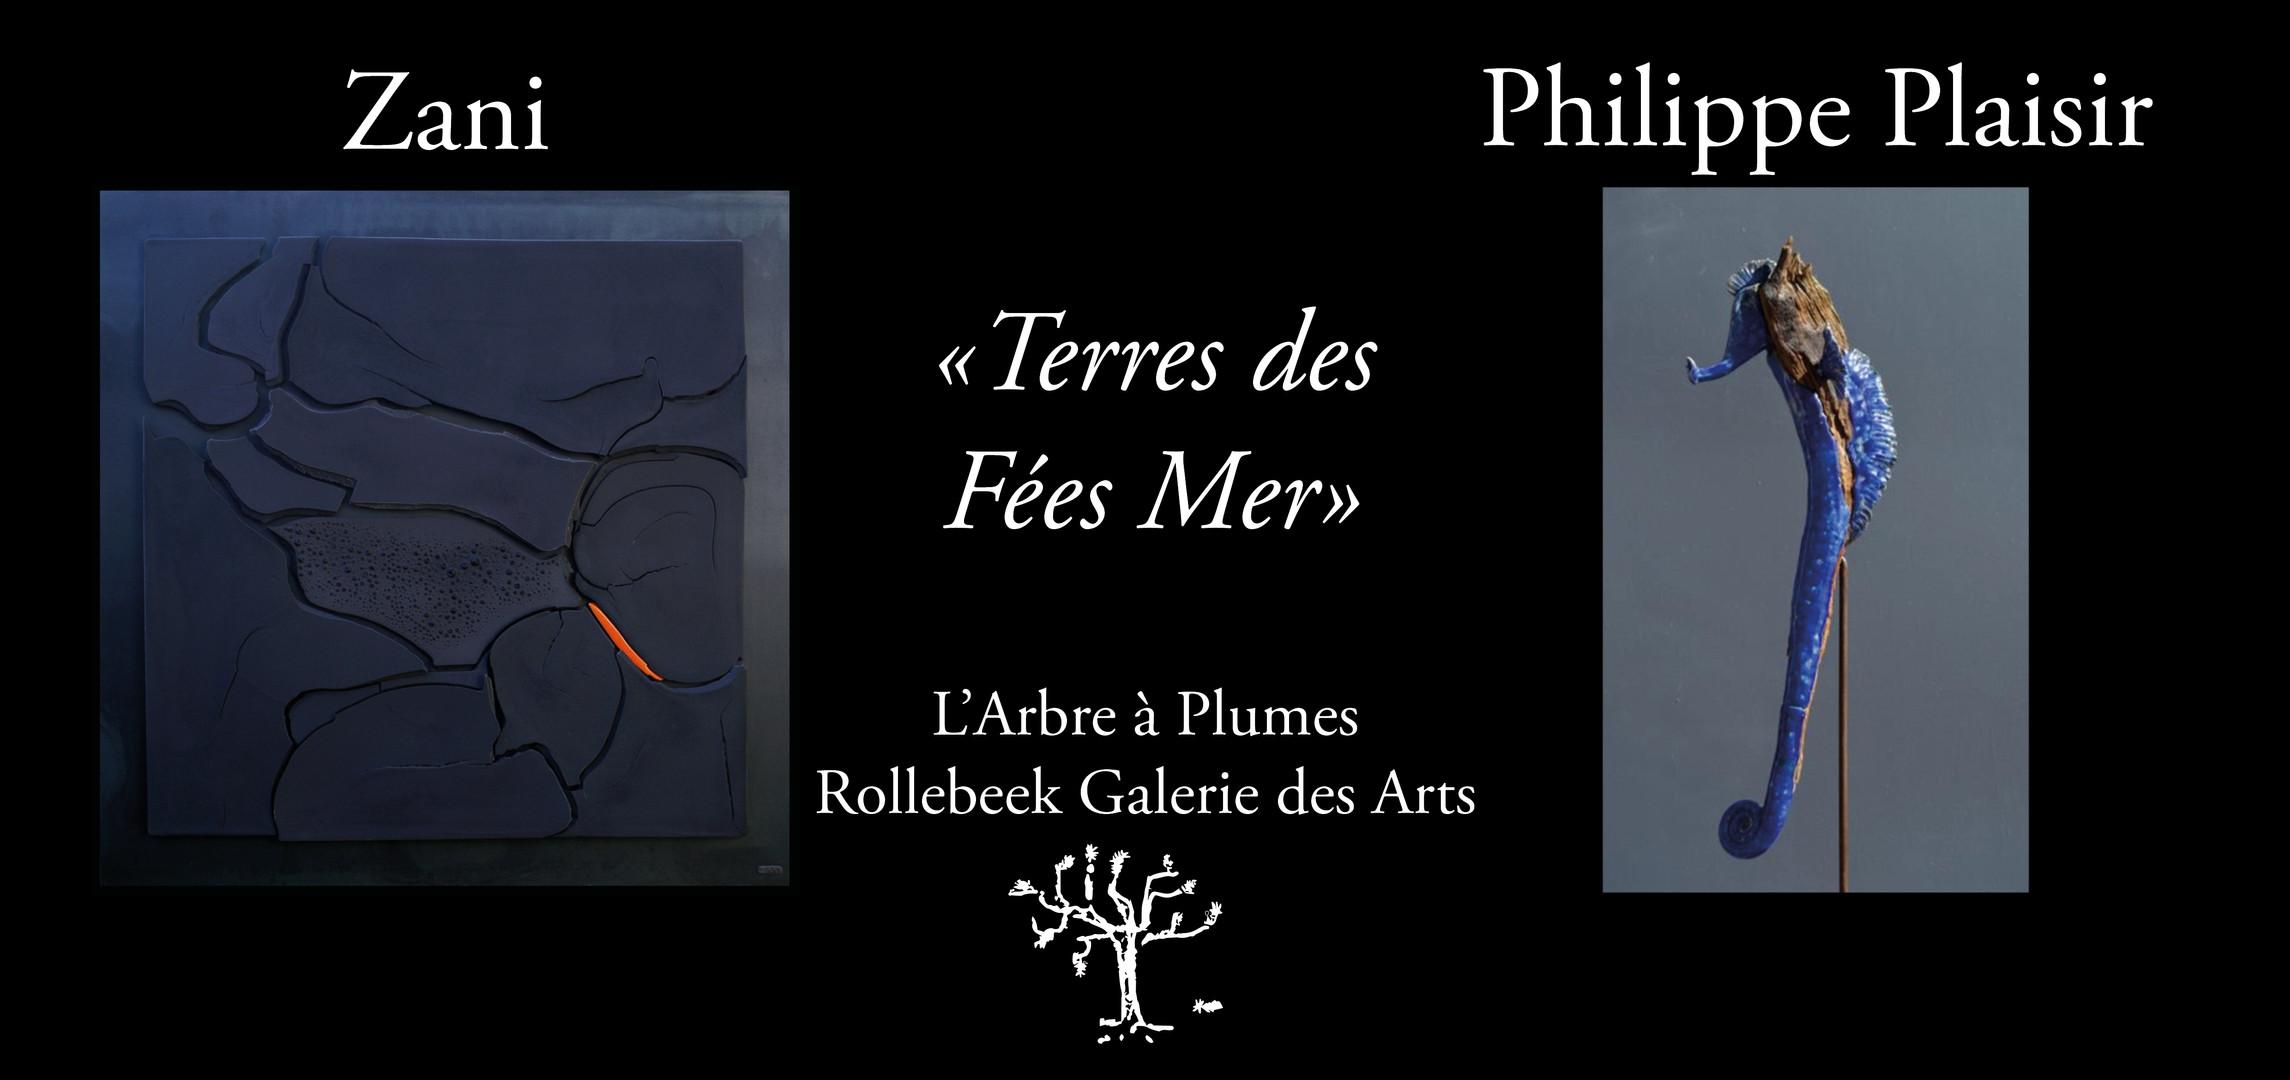 Zani et Philippe Plaisir